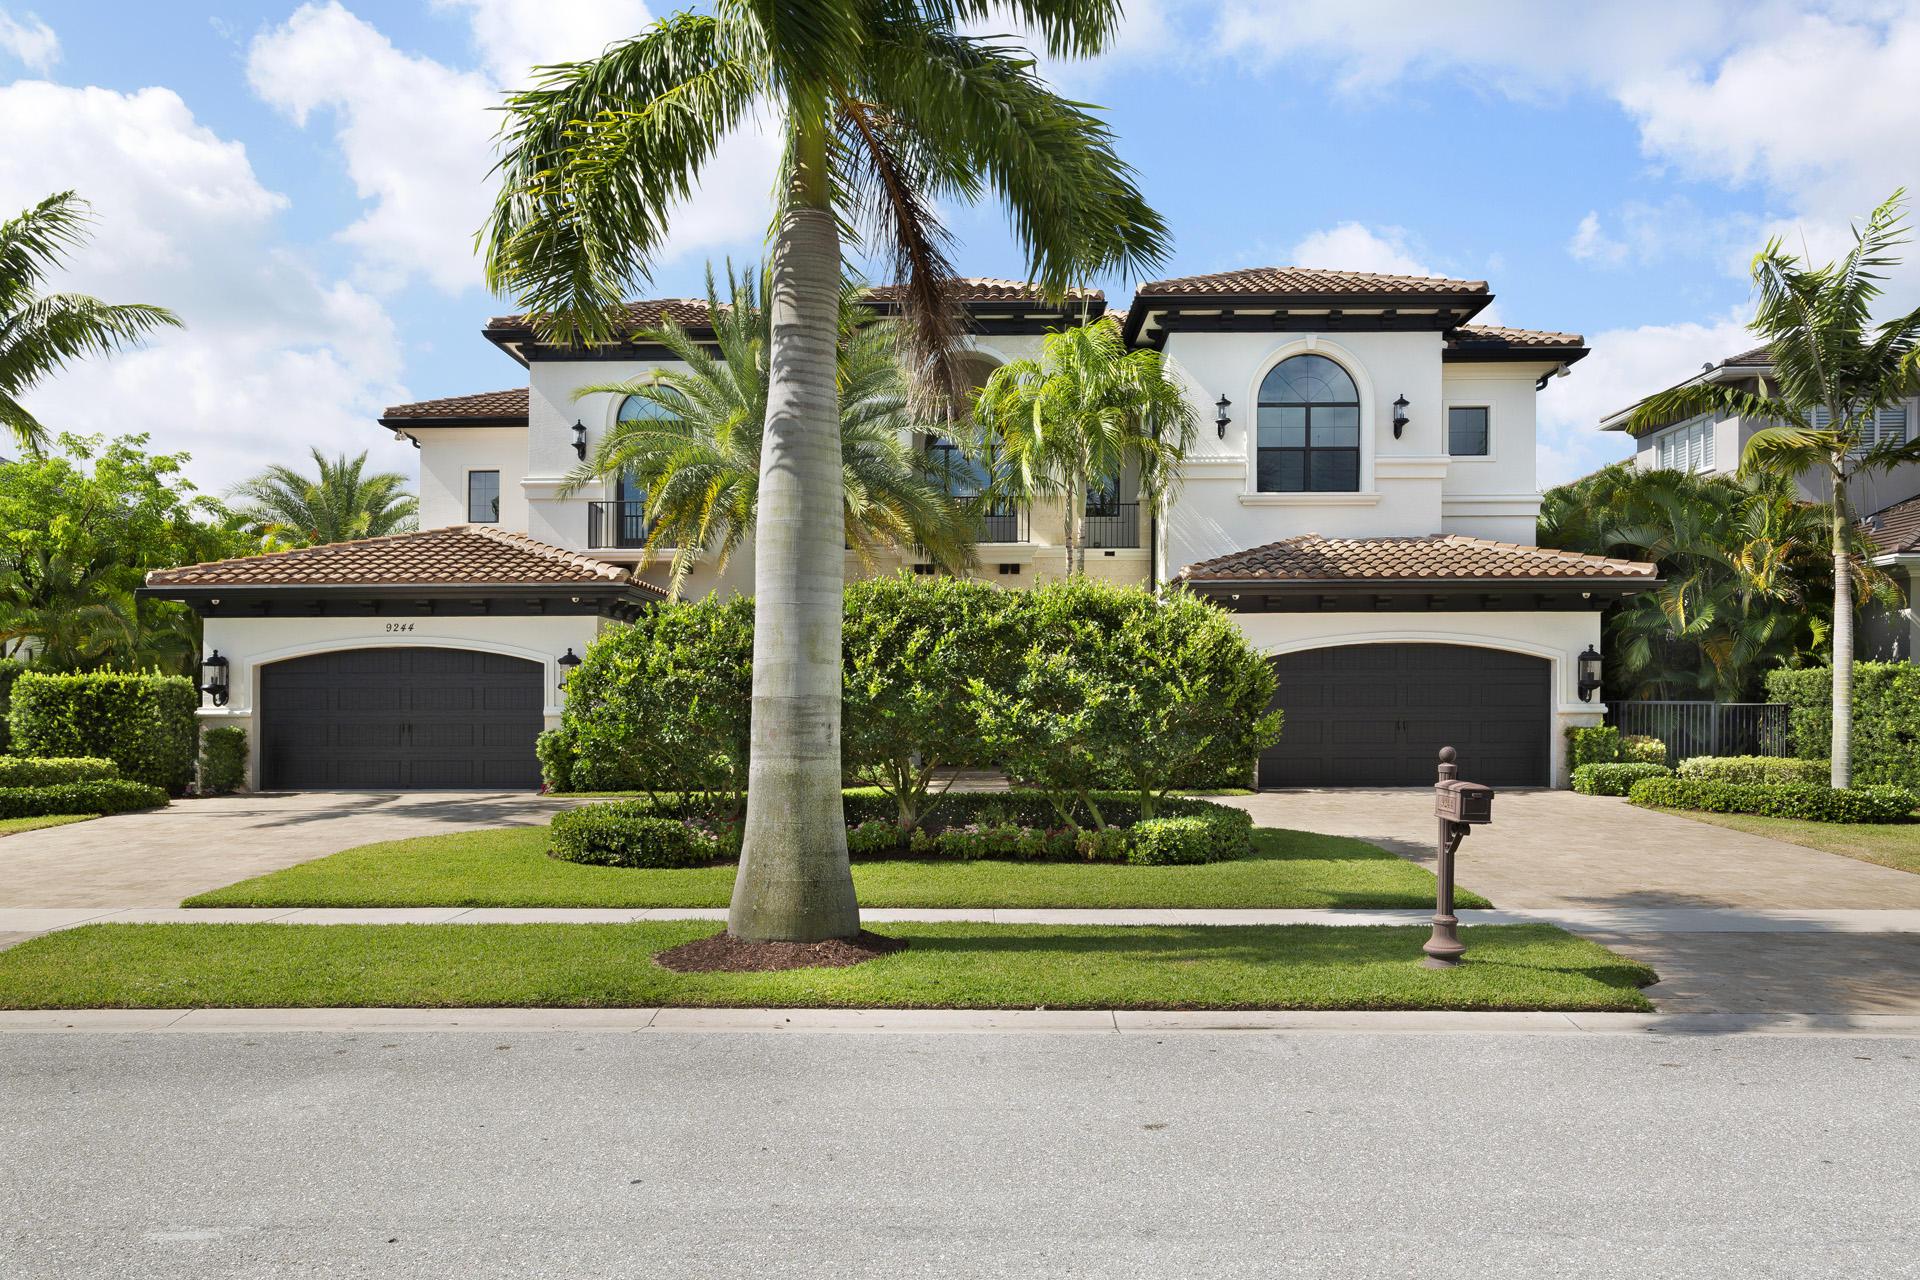 Photo of 9244 Este Lago Drive, Boca Raton, FL 33496